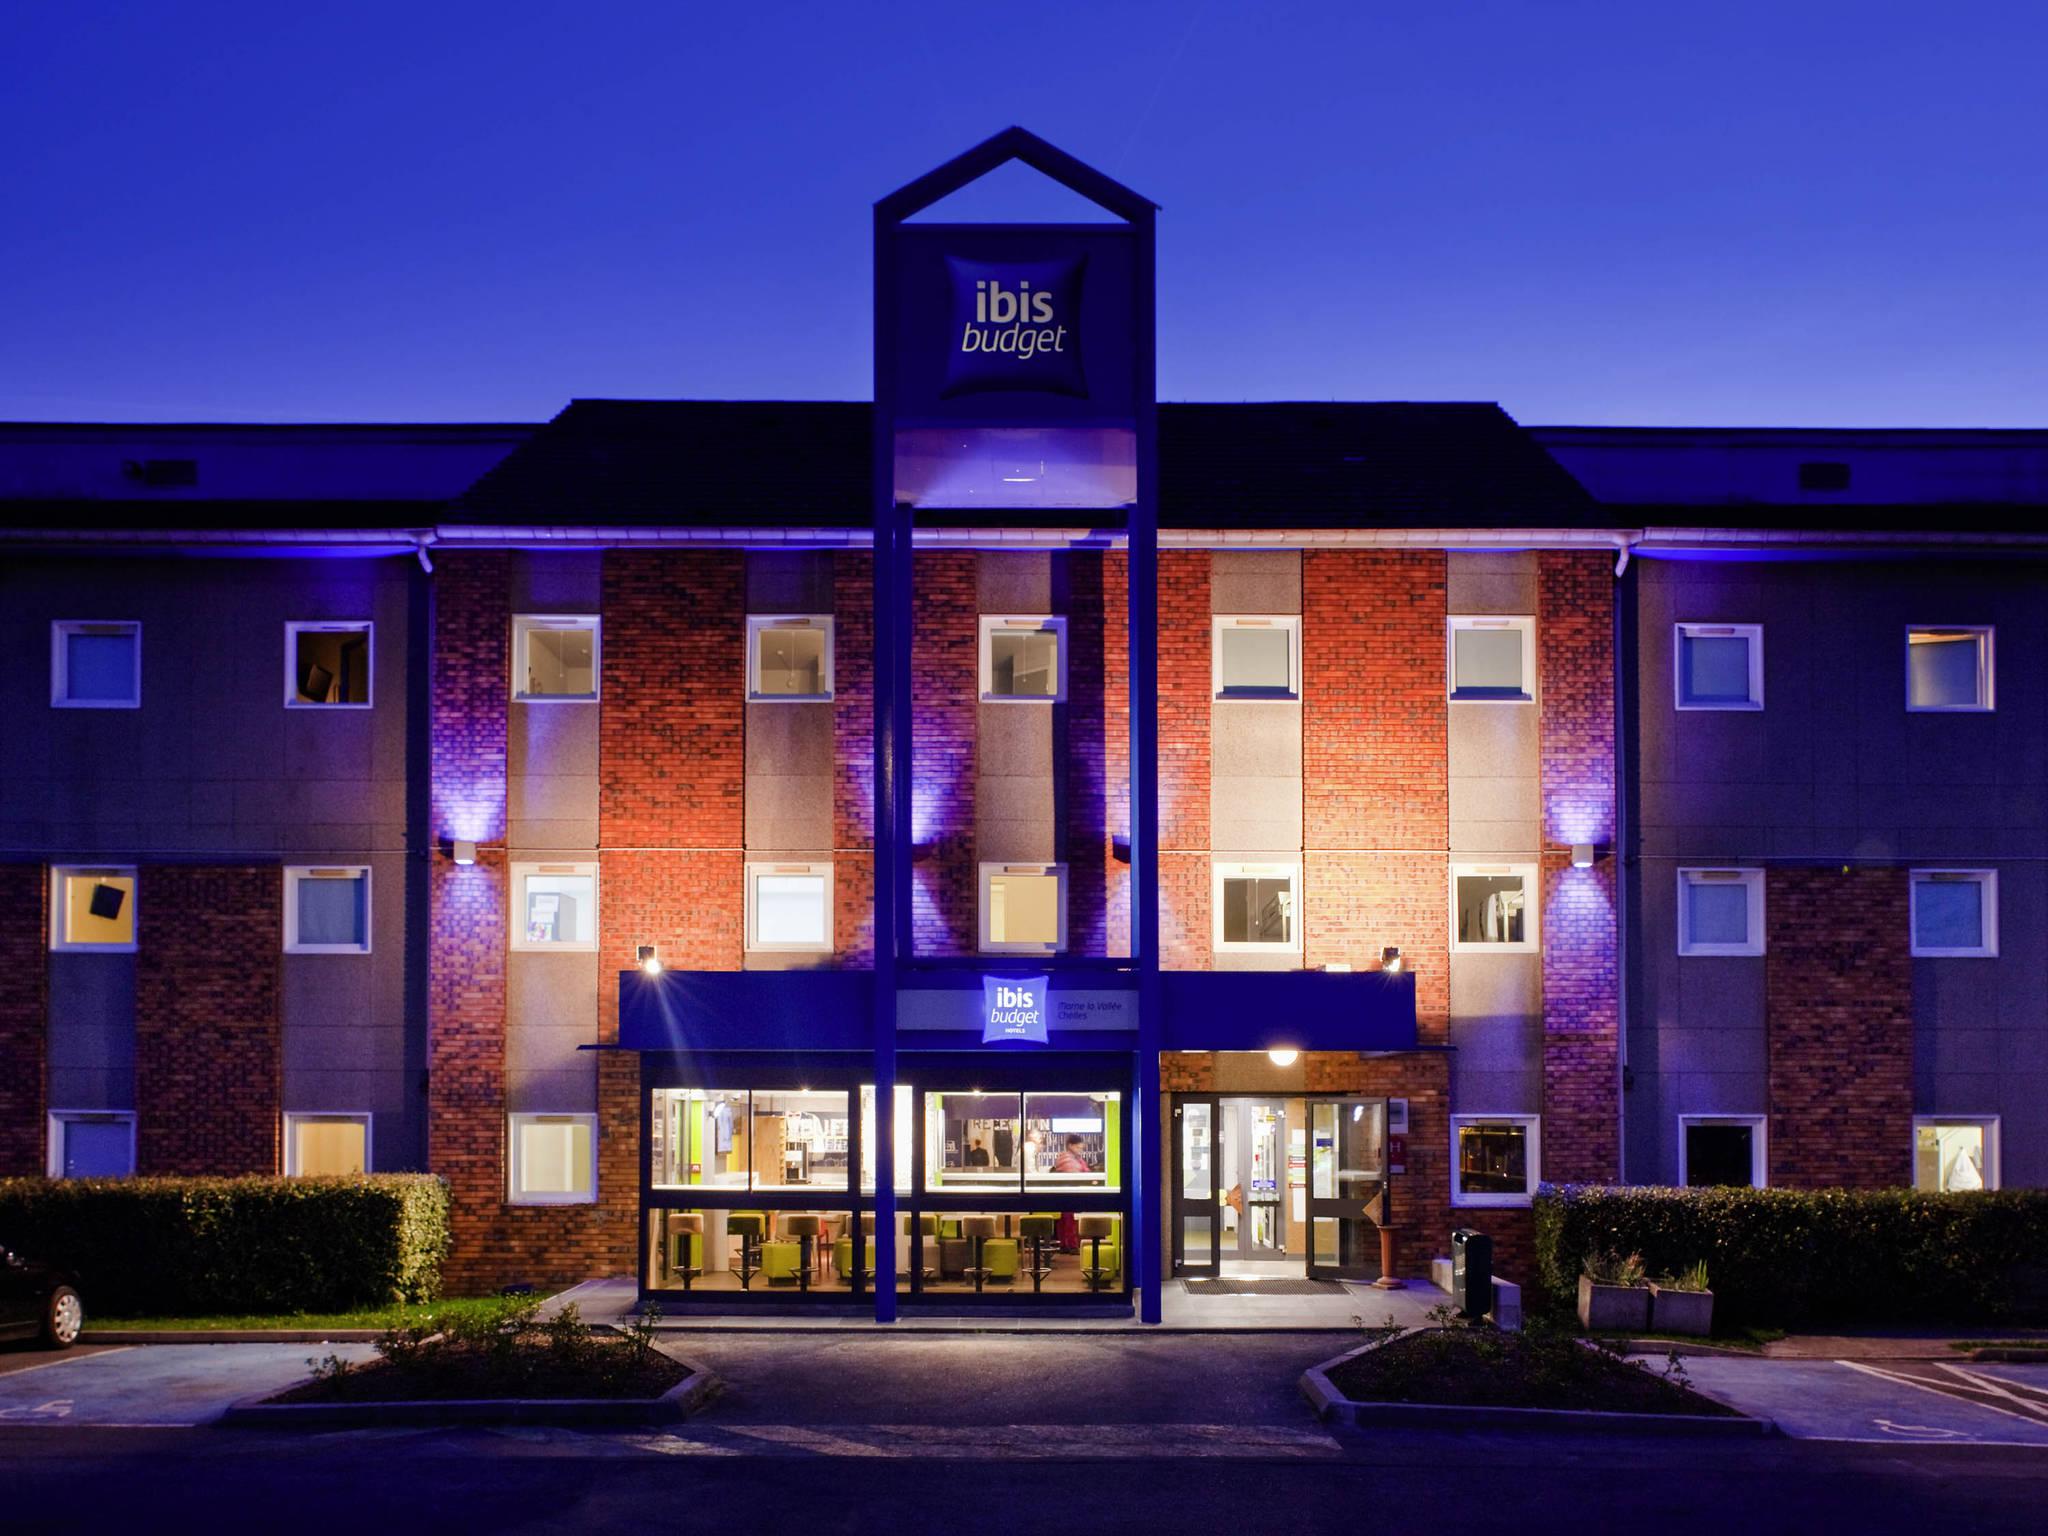 Hotel – ibis budget Marne la Vallée Chelles